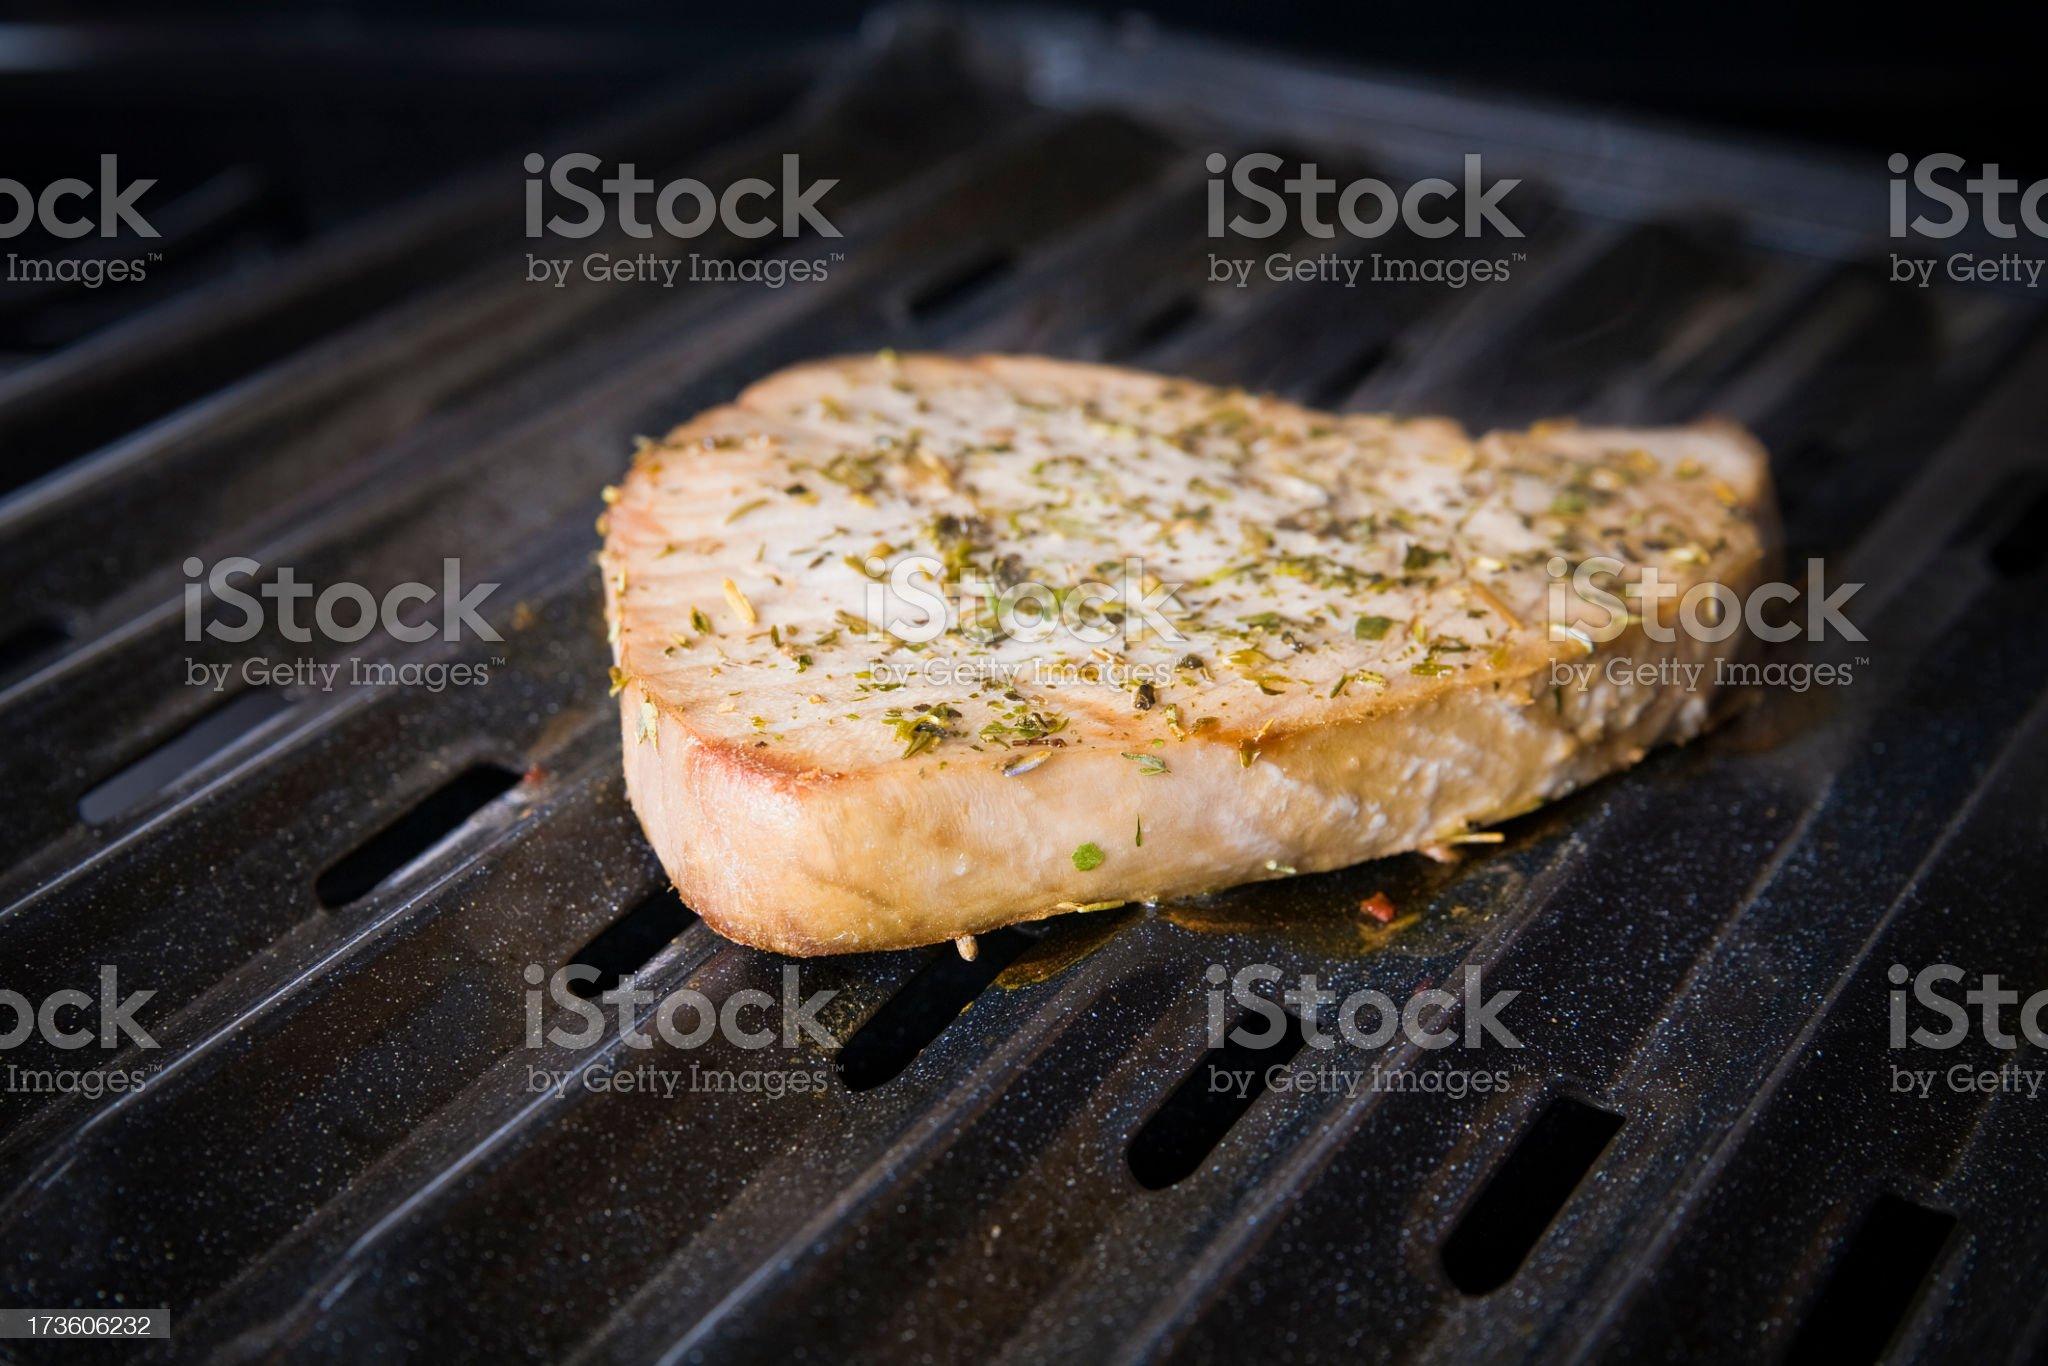 Broiled Tuna Steak royalty-free stock photo